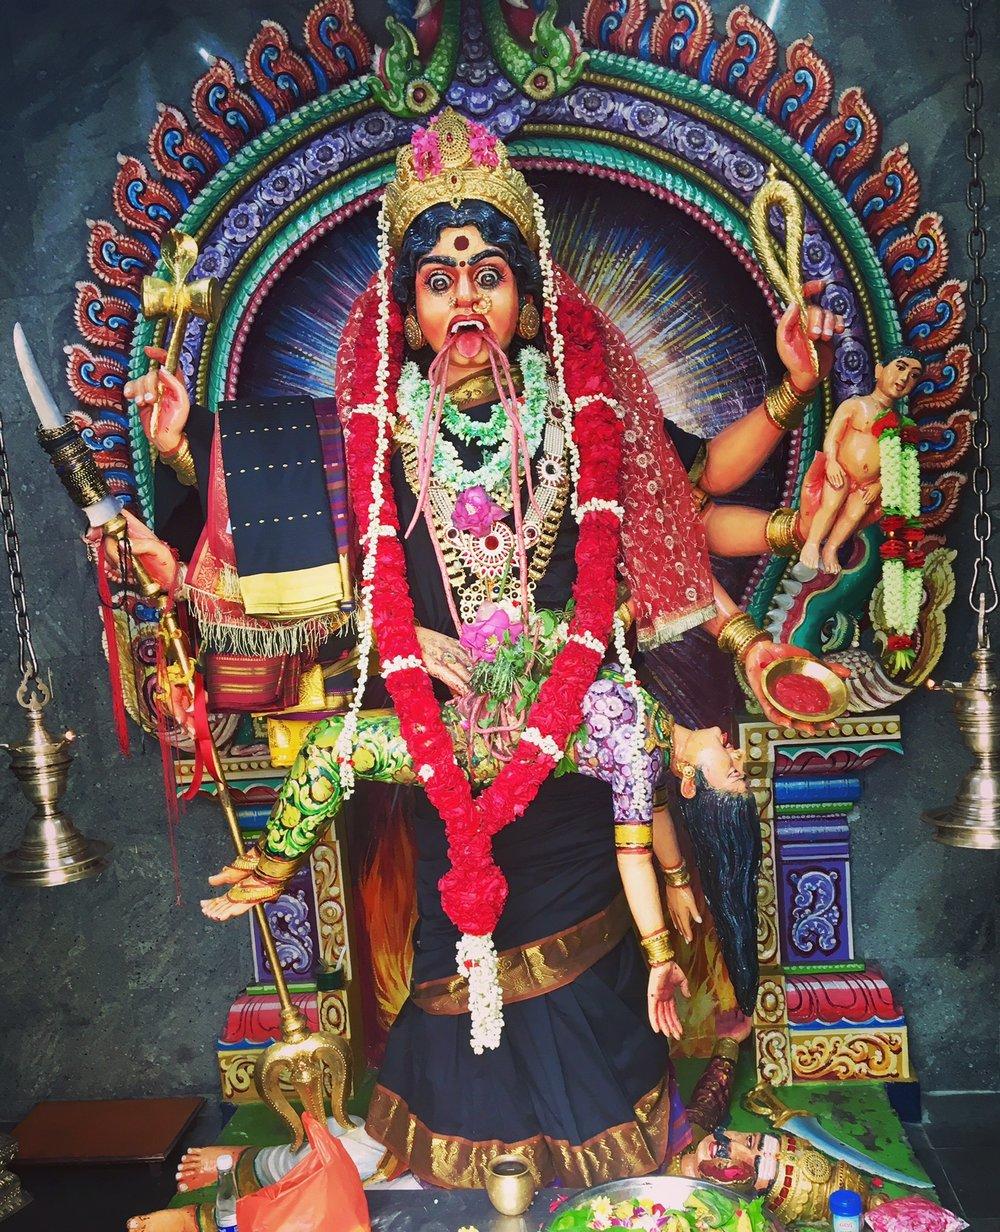 Goddess statue at the Sri Veeramakaliamman Temple, Serangoon Rd.